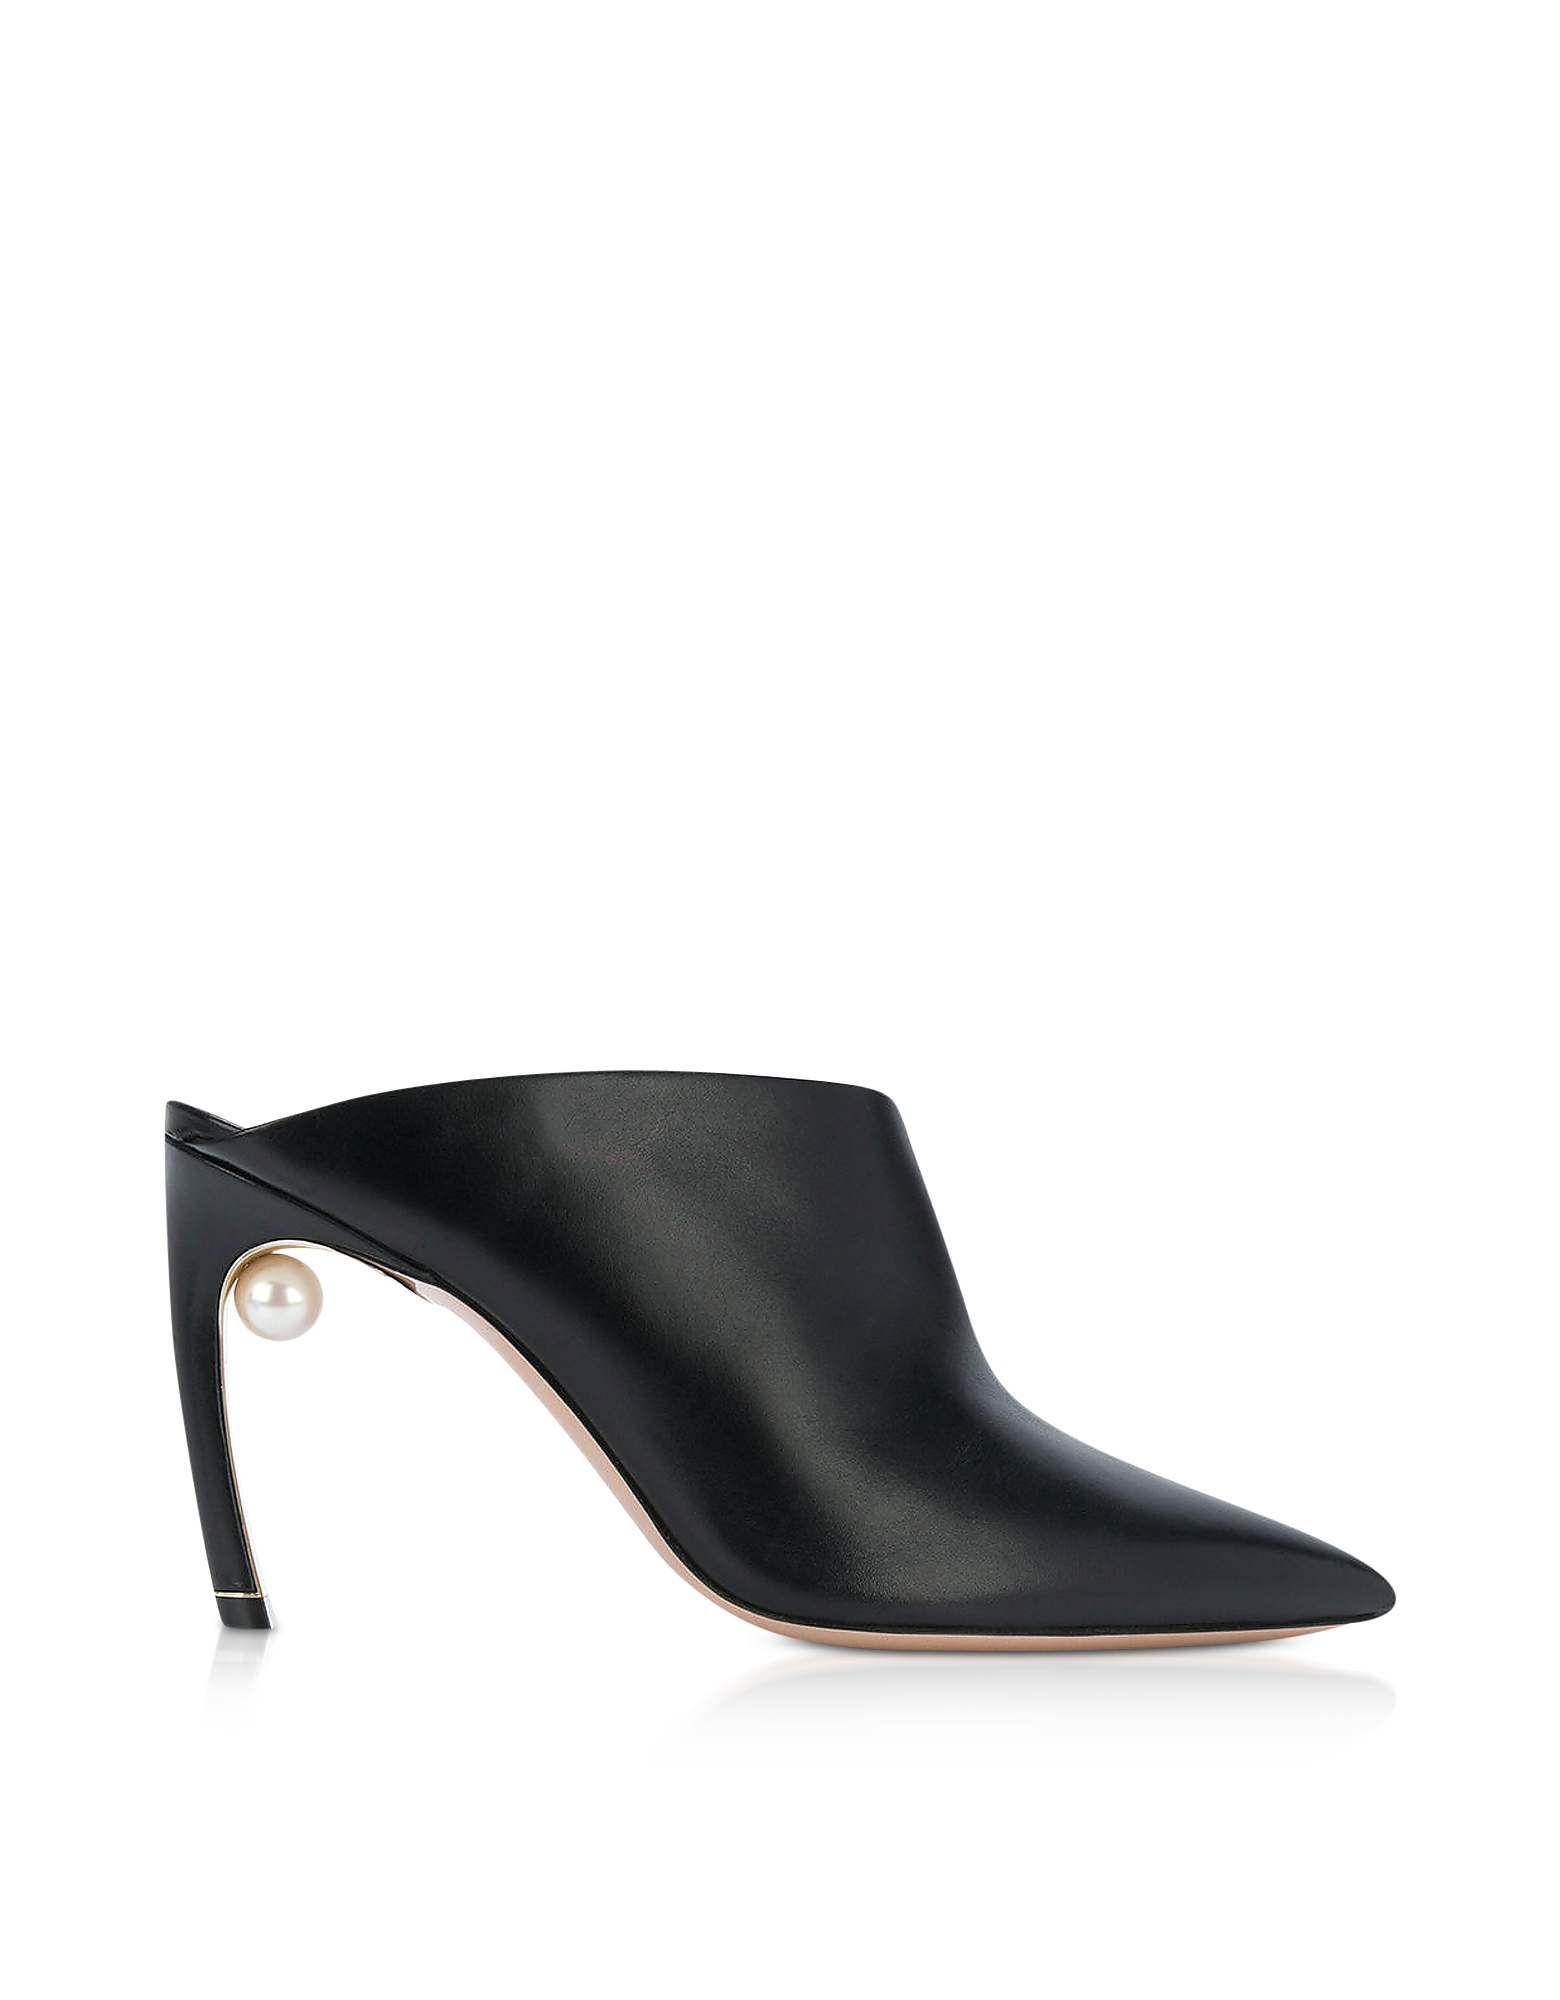 Nicholas Kirkwood Shoes, Black Nappa 90mm Mira Pearl Mules